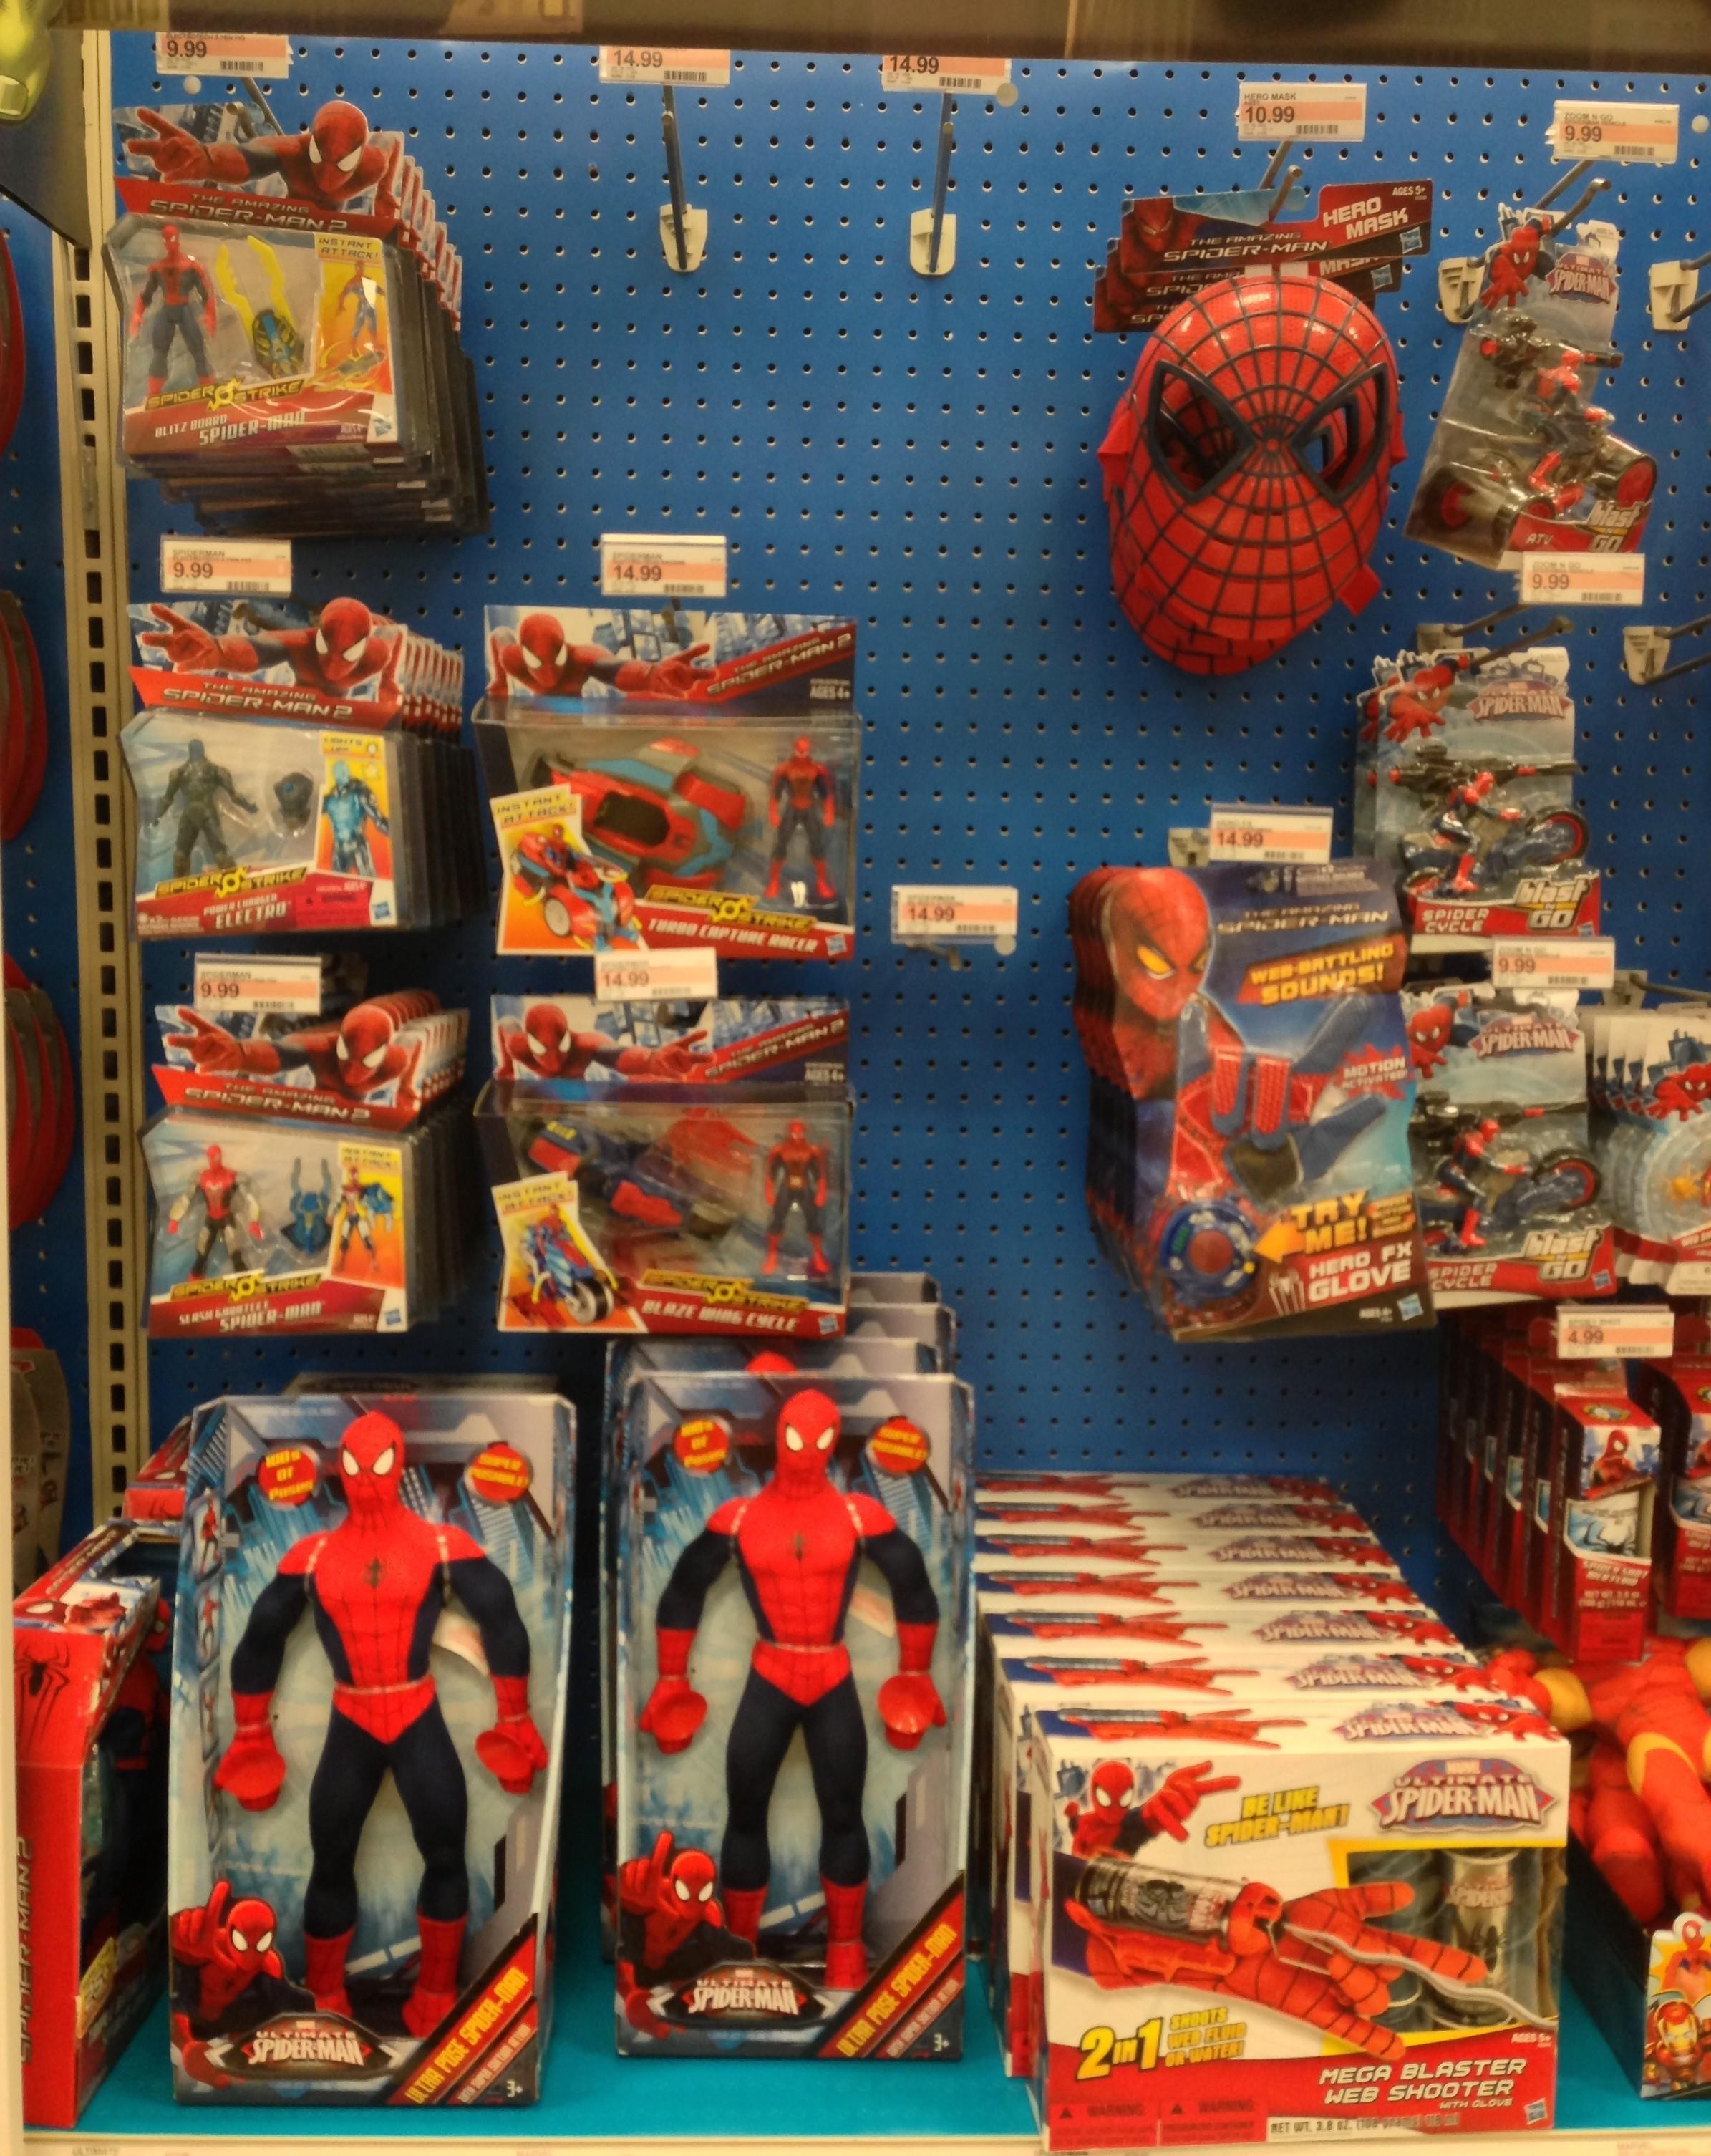 New Spider Man 2 Toys : Hasbro amazing spider man quot figures released photos